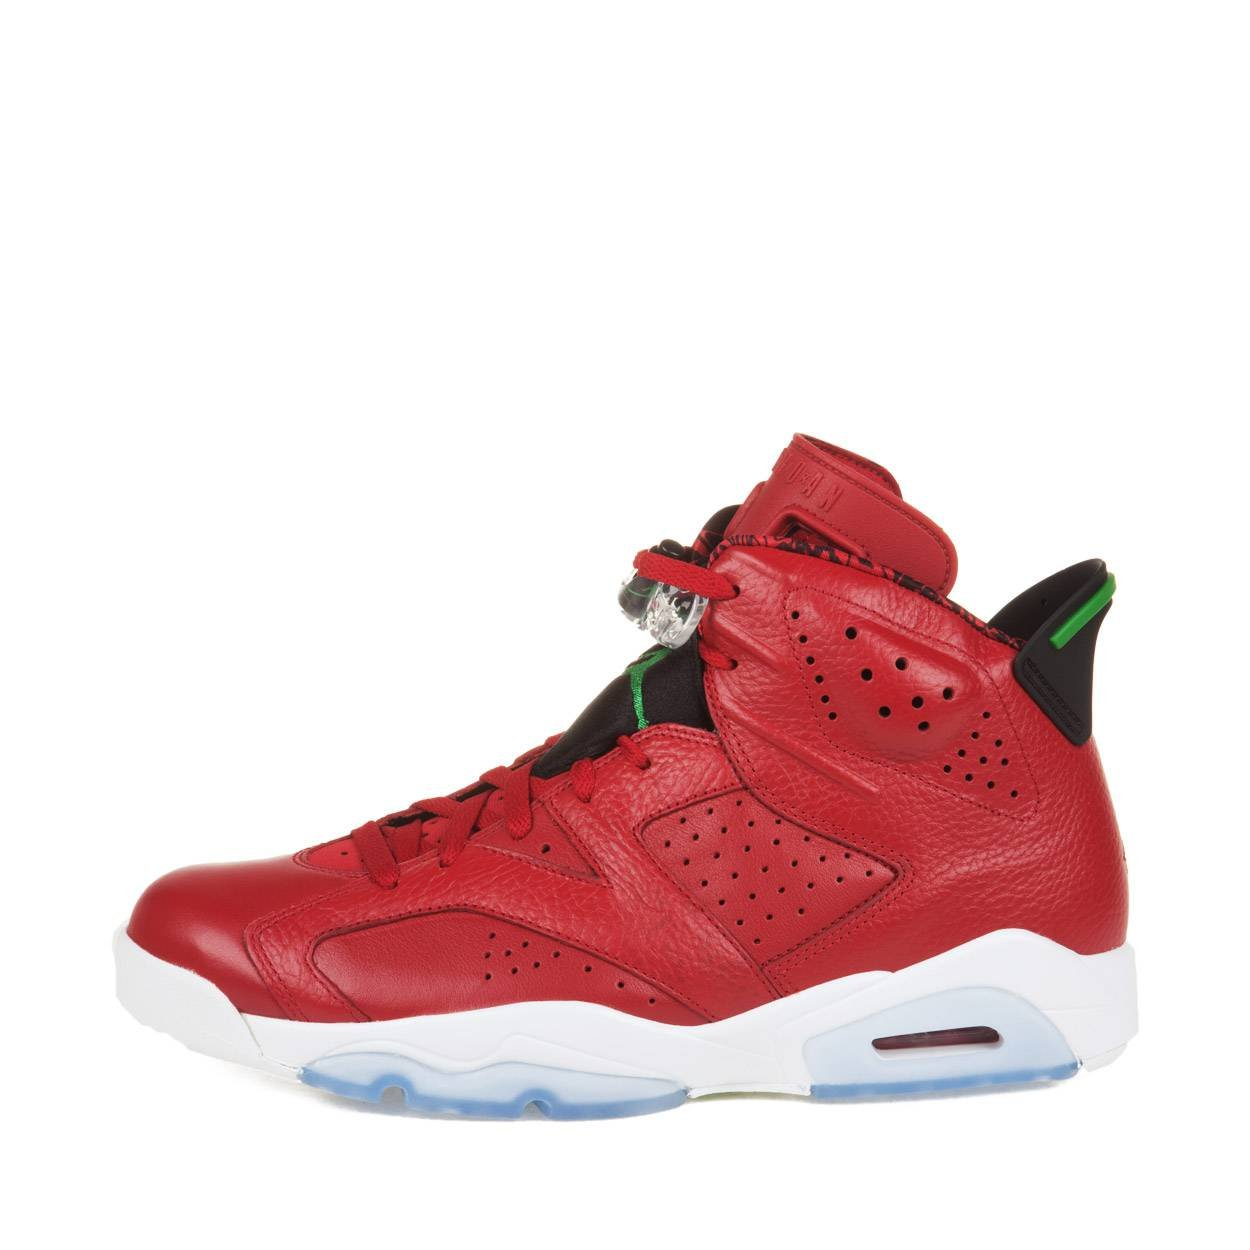 reputable site cd5a3 10461 Amazon.com   Nike Air Jordan 6 Retro Spizike